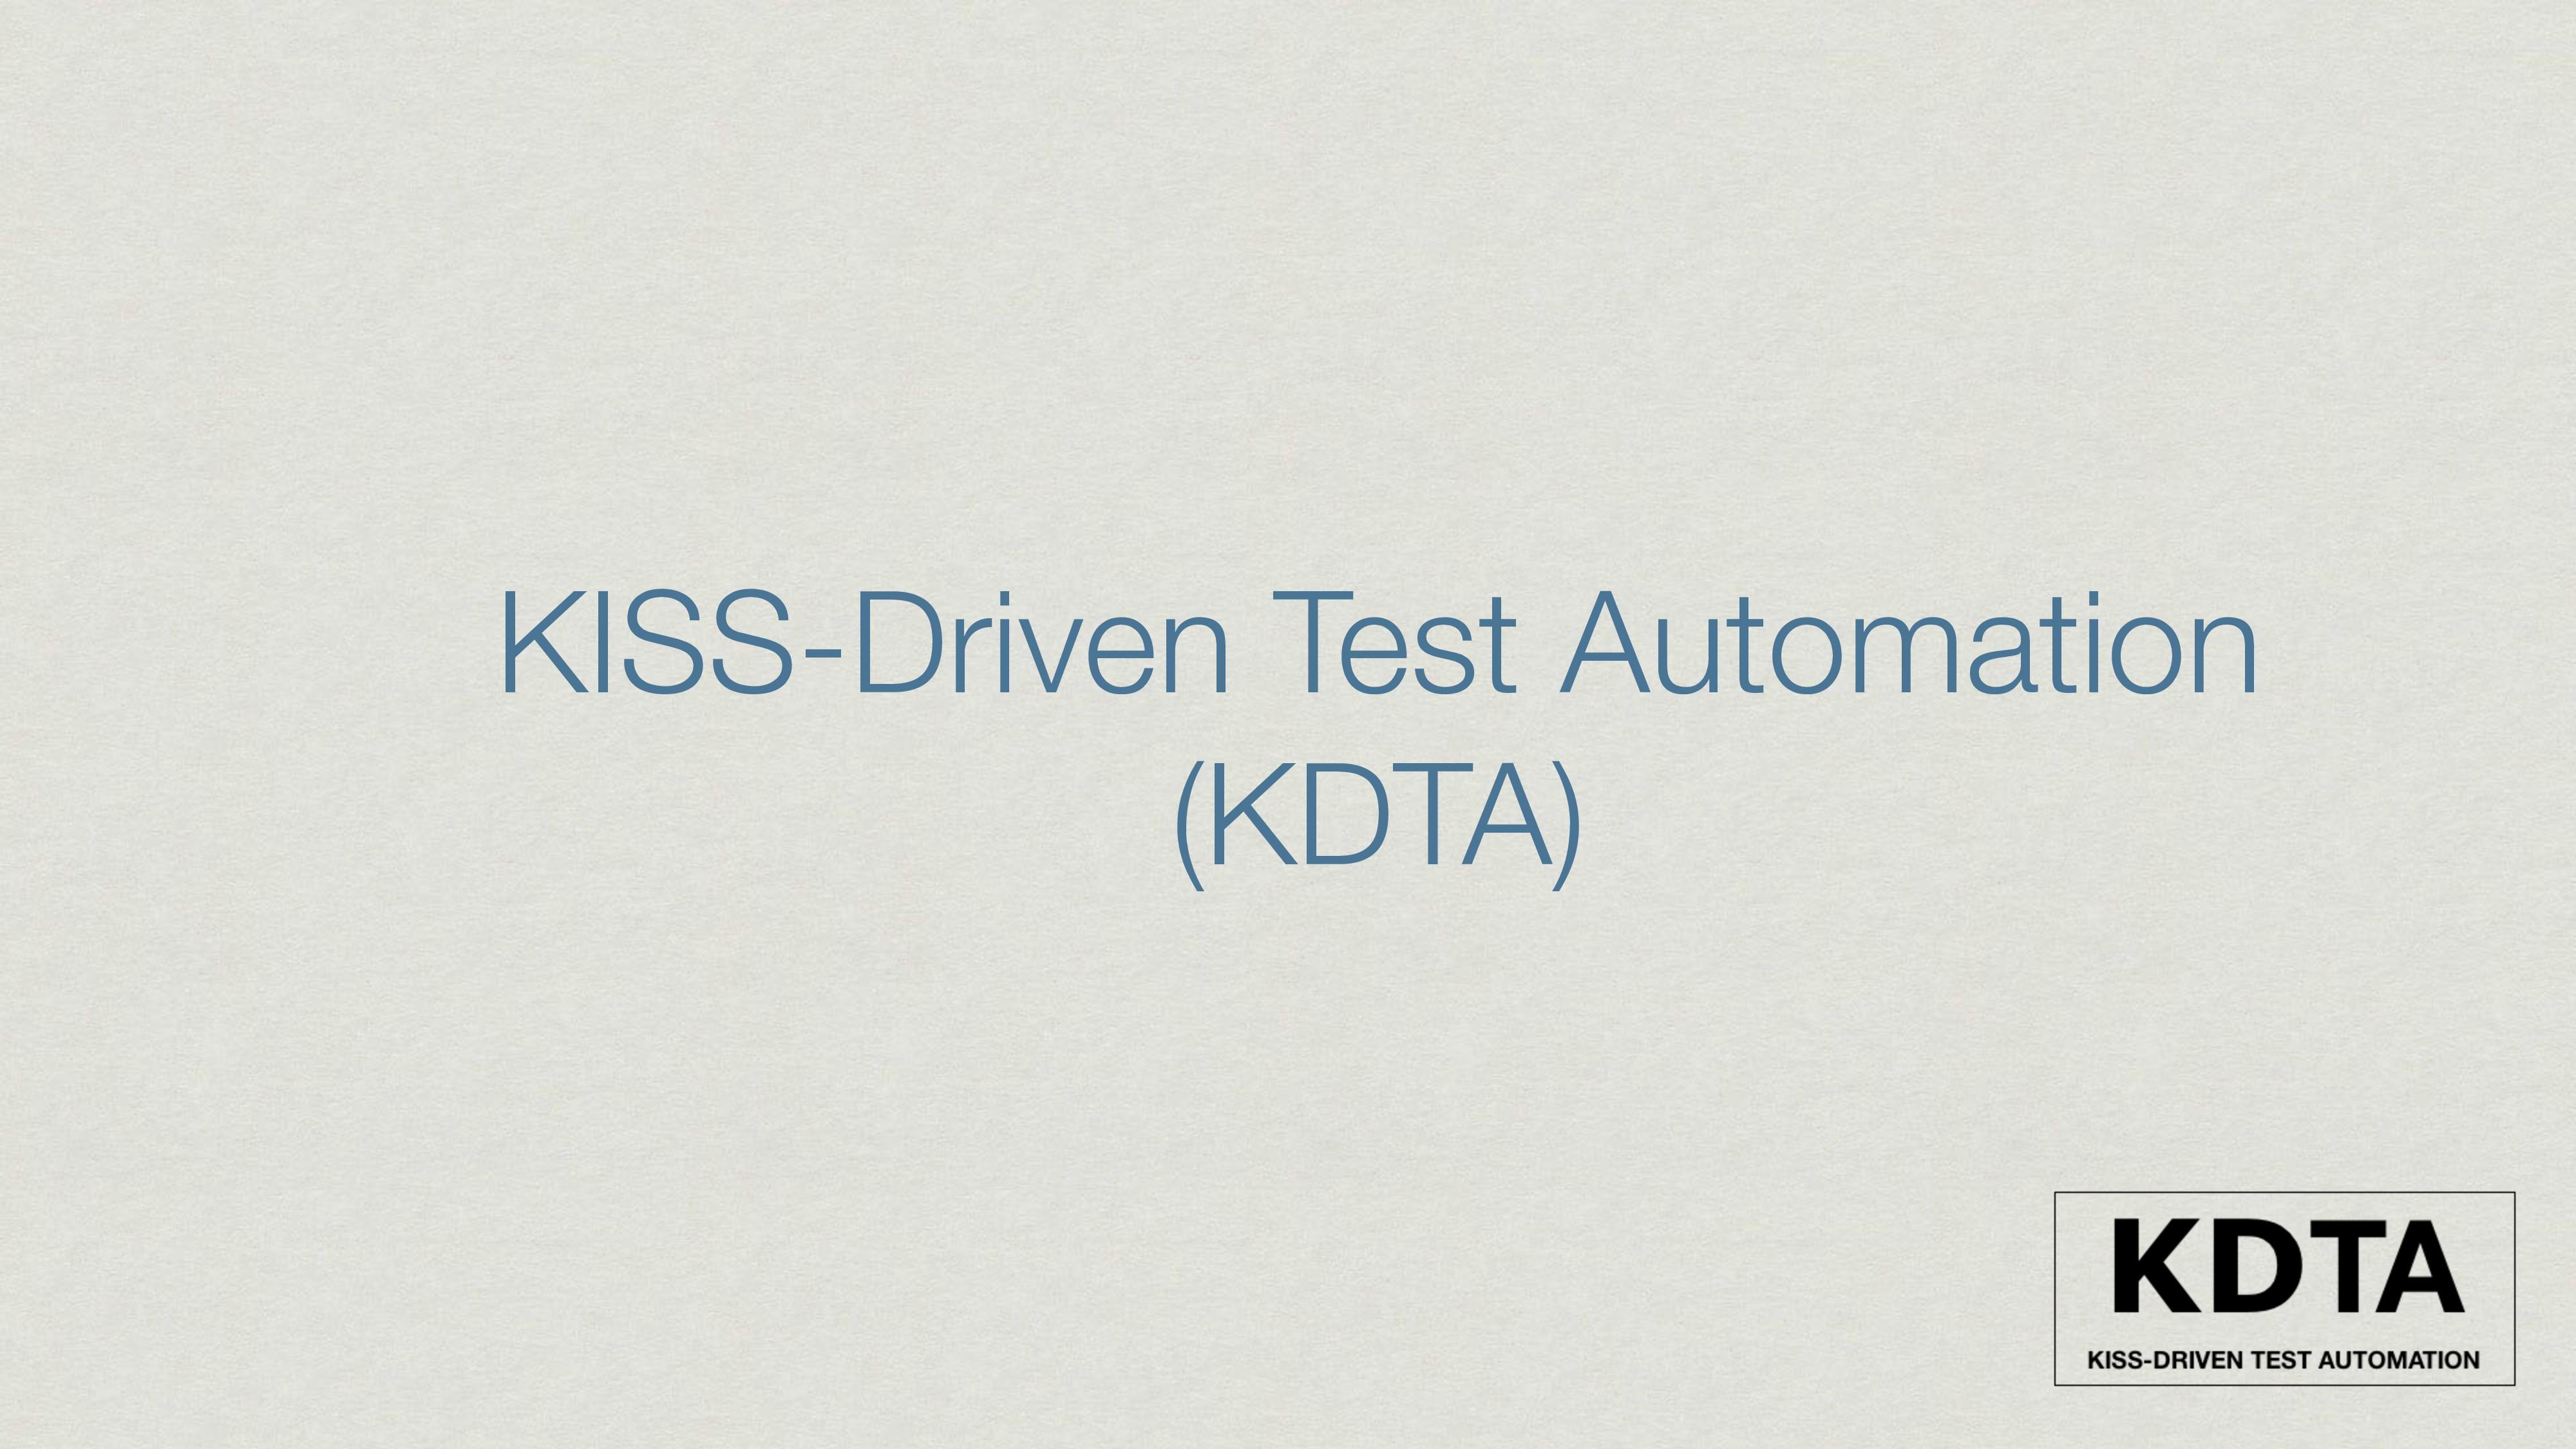 KISS-Driven Test Automation (KDTA)